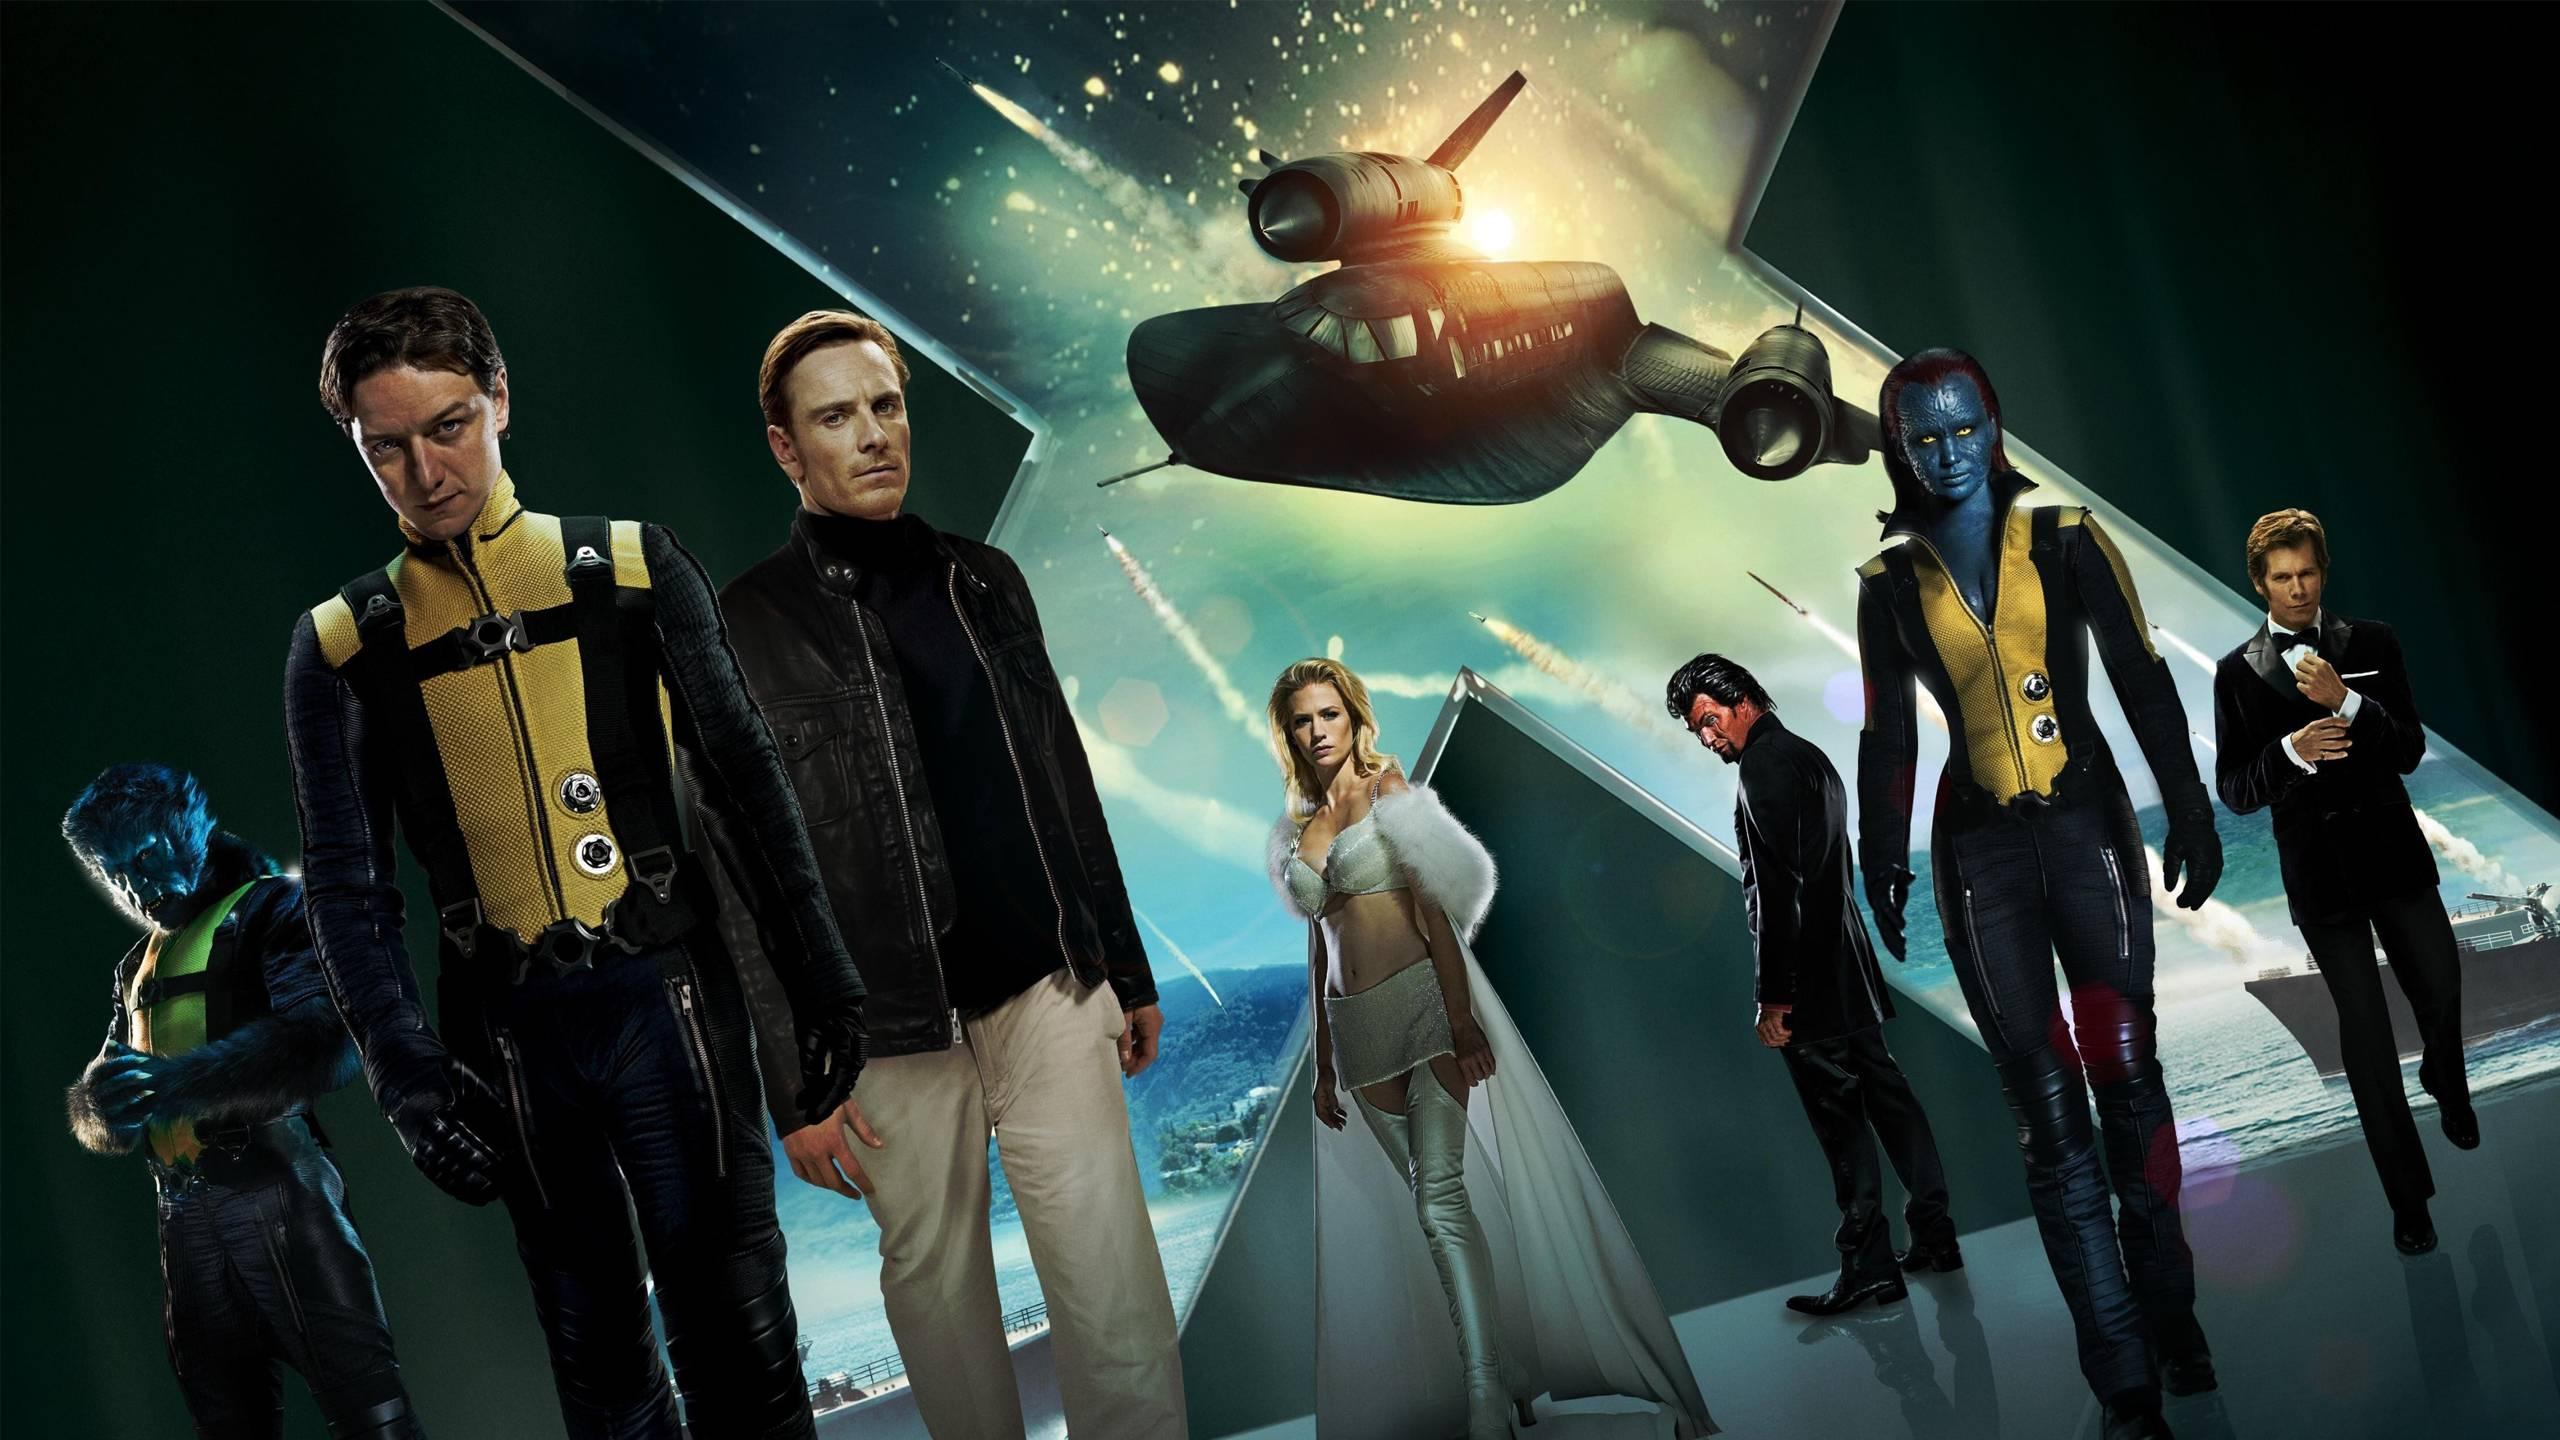 Wallpaper : Michael Fassbender, movies, music, Marvel Comics, X Men